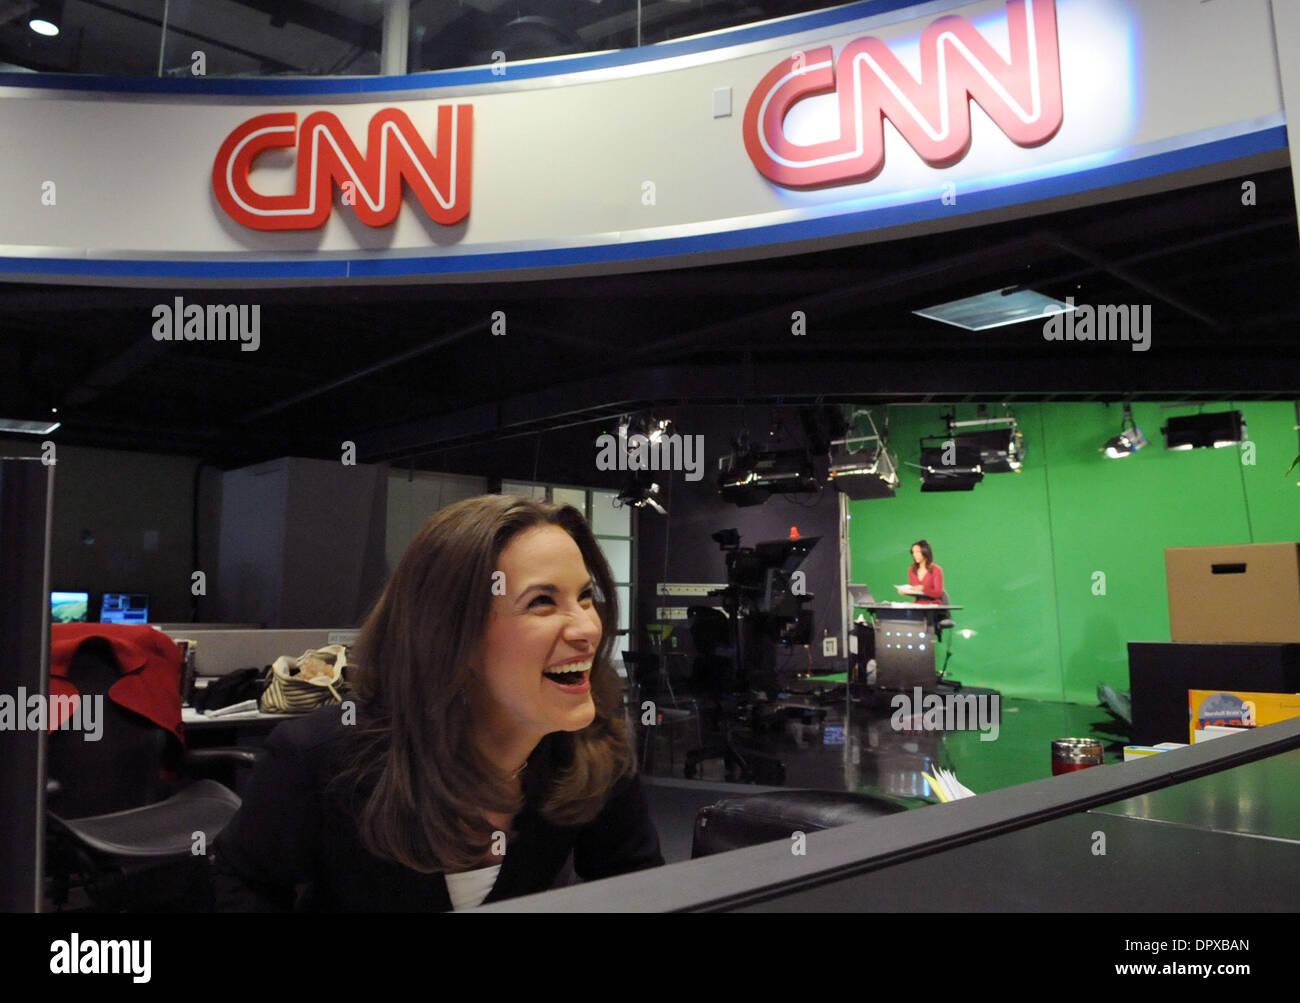 Jan 13, 2009   Atlanta, Georgia, USA   CNN.com Live Anchor MELISSA LONG  Speaks With Colleagues In The CNN.com Newsroom At The CNN Center. Part 66